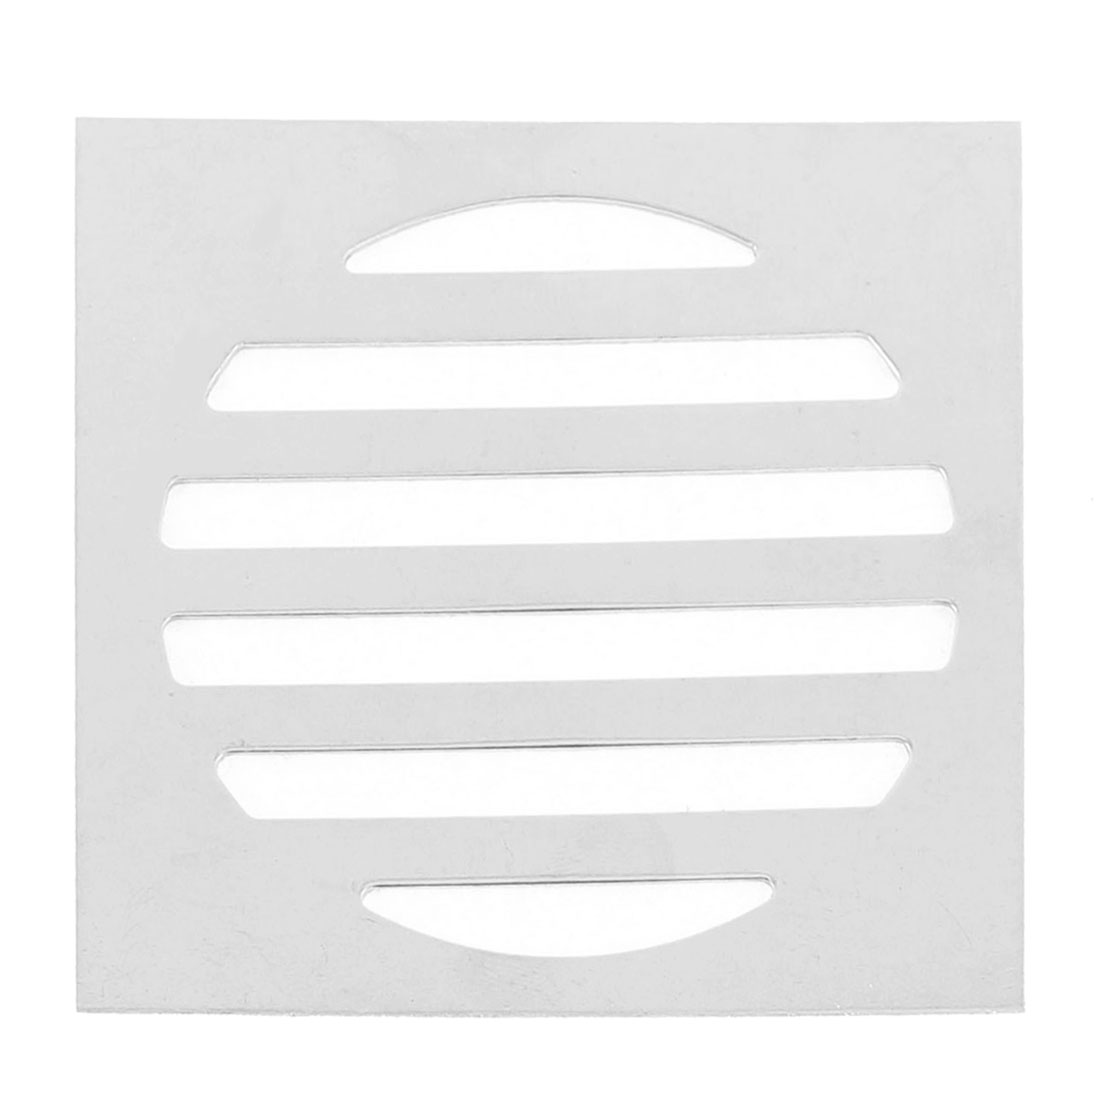 "Stainless Steel Kitchen Bathroom Square Floor Drain Cover 3"" 7.5cm"